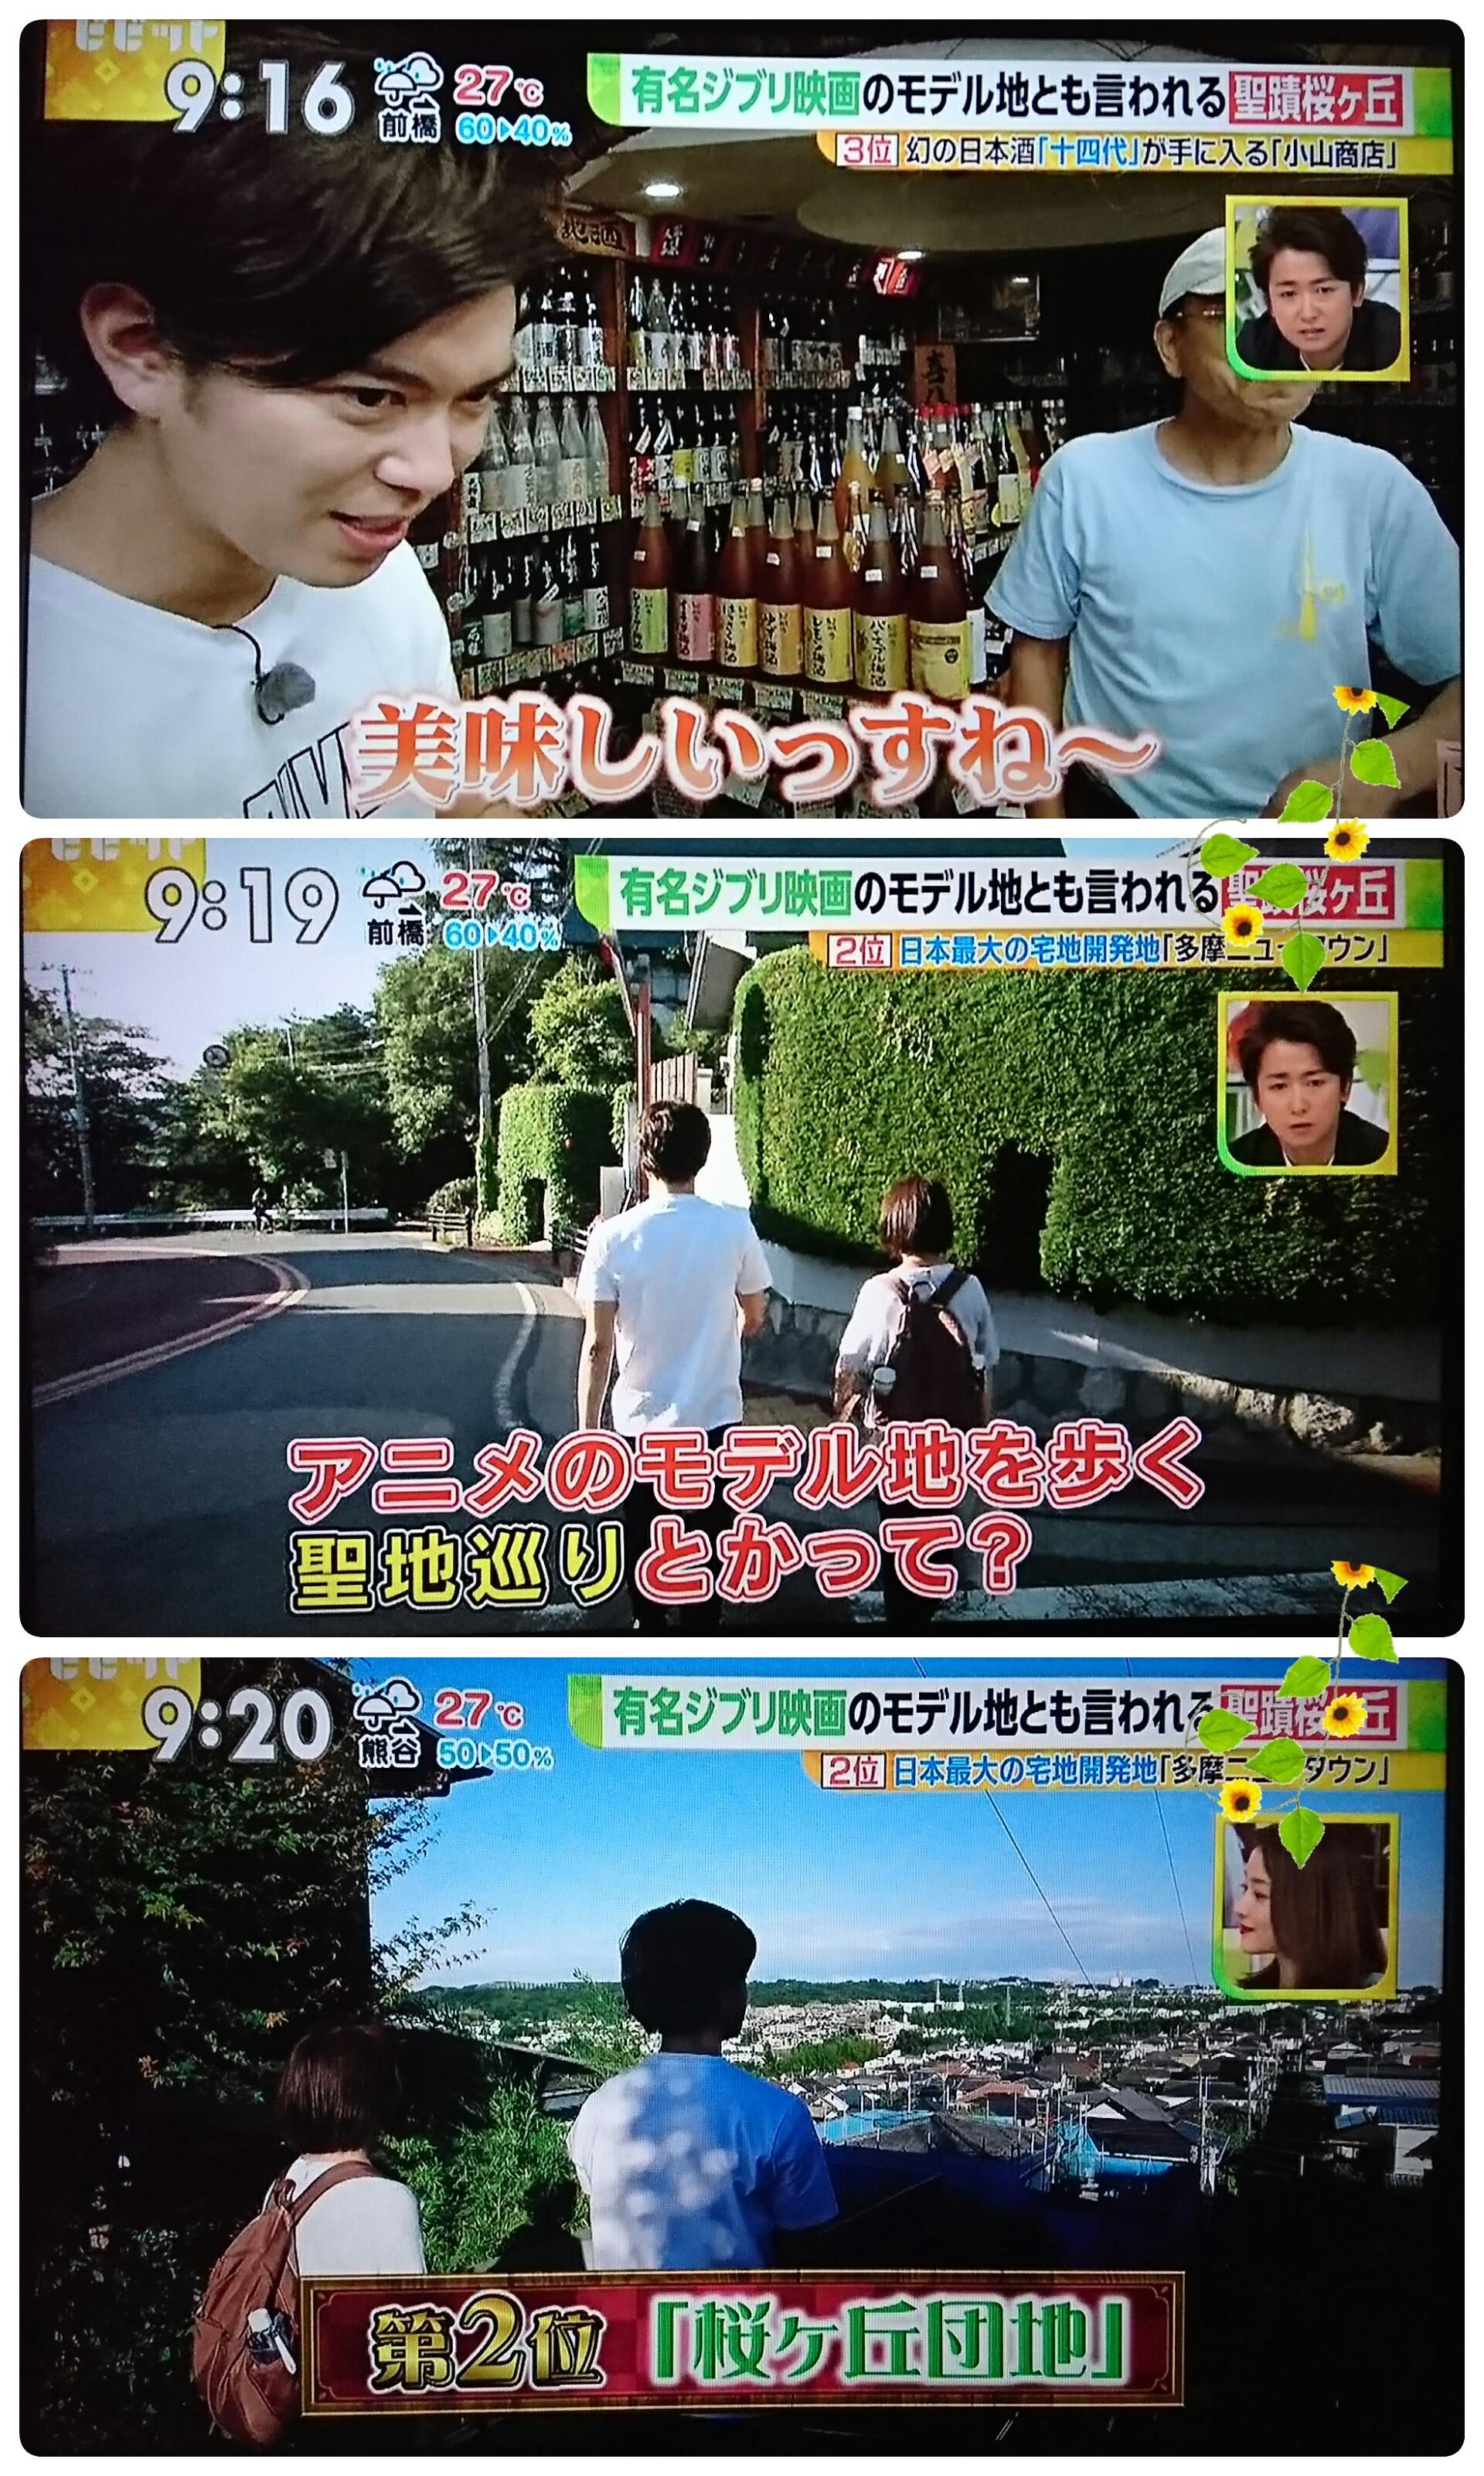 f:id:sunflower-shigeaki:20170708205340j:image